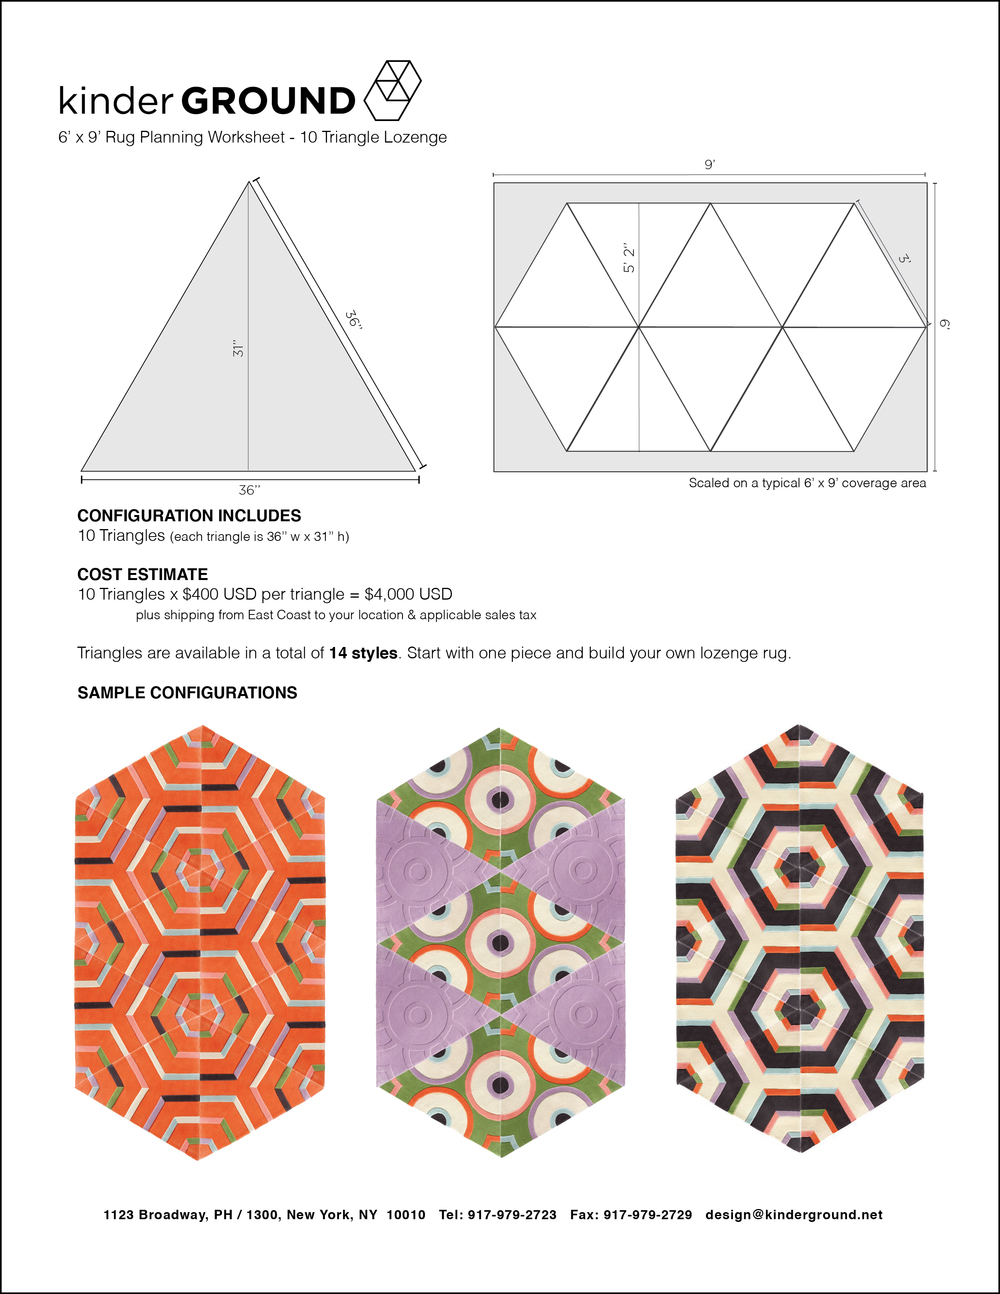 10-Triangle Lozenge